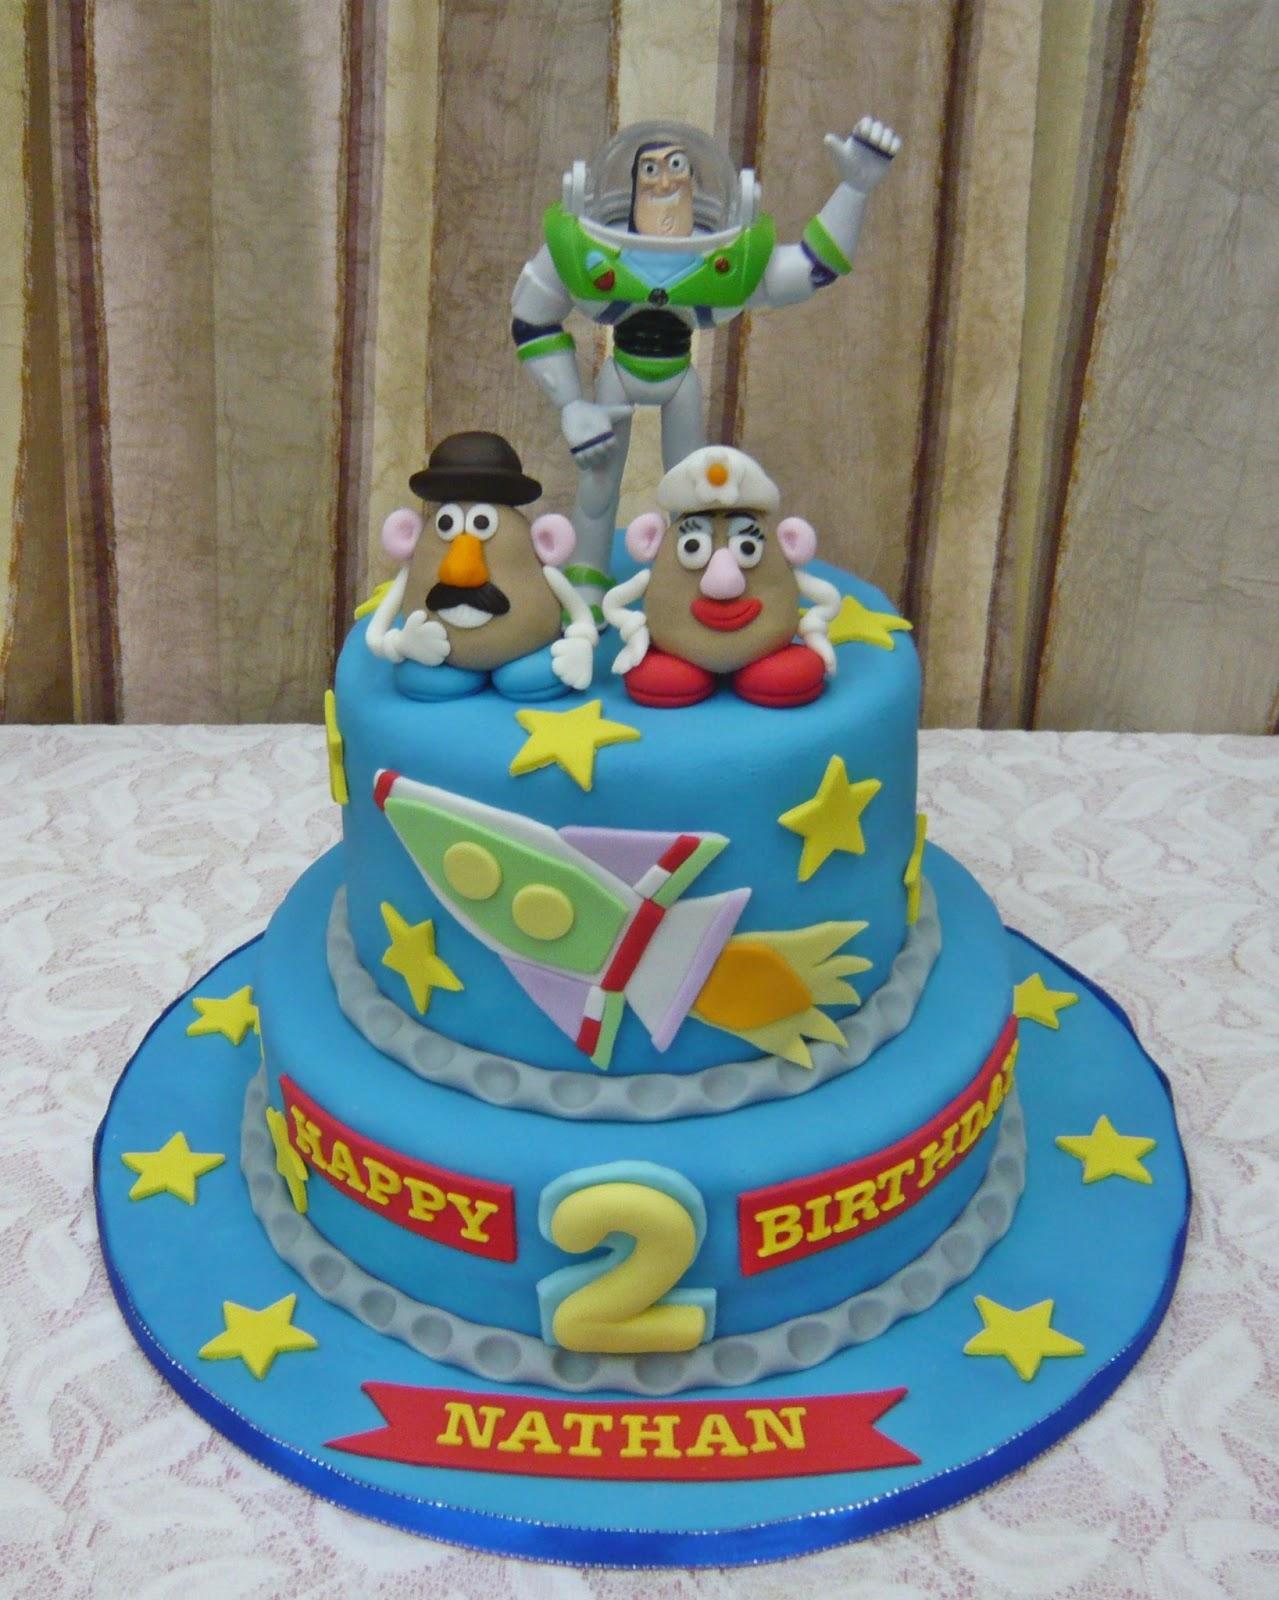 jenn cupcakes  u0026 muffins  buzz lightyear  toy story  theme cake